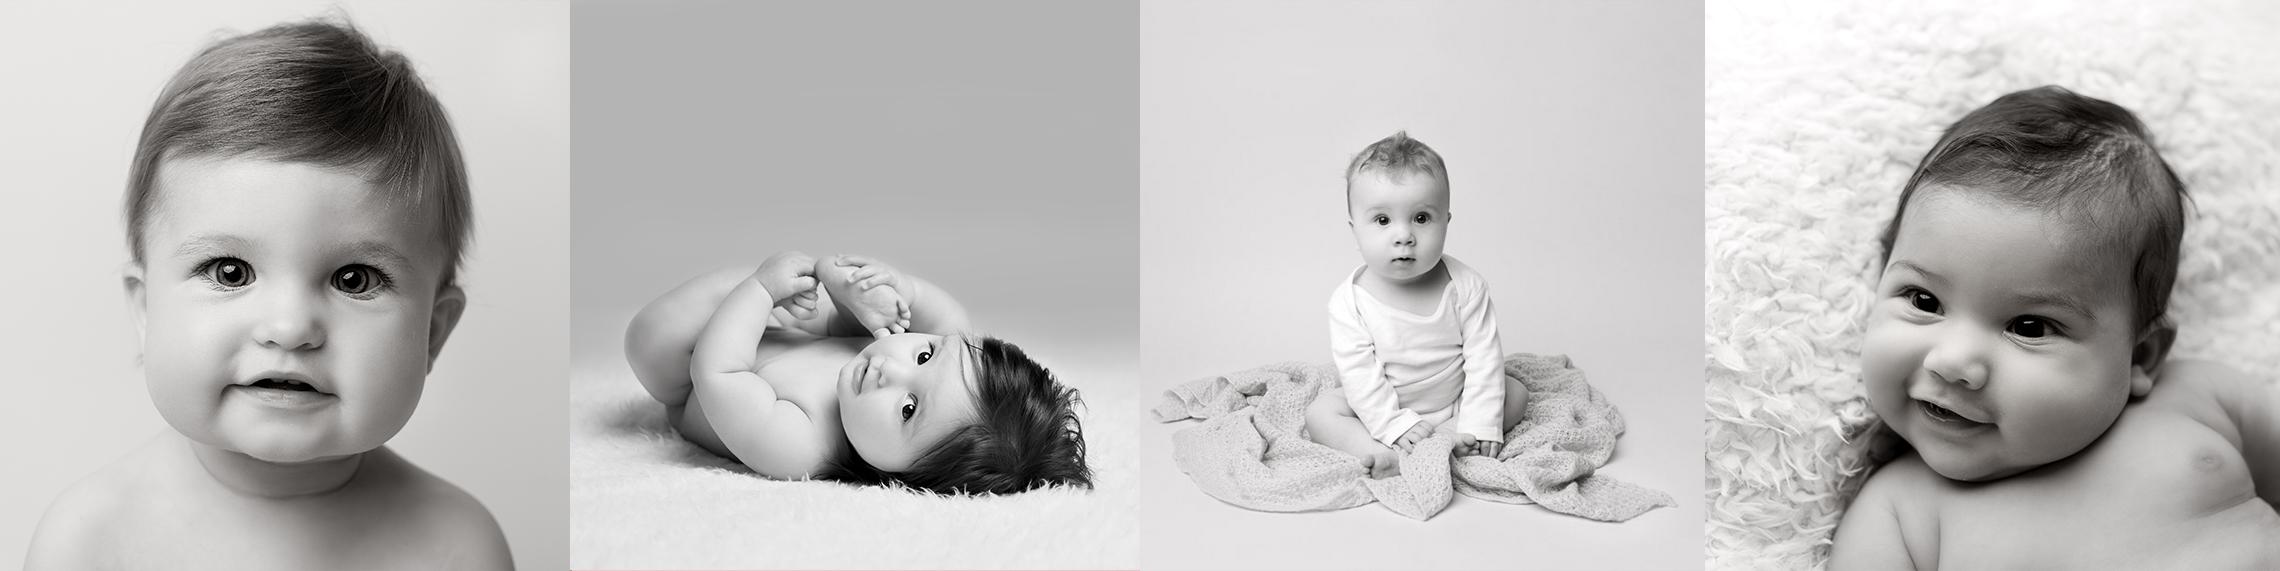 baby photographer edinburgh, professional baby photos from newborn to one year old by Beautiful Bairns Photography Edinburgh